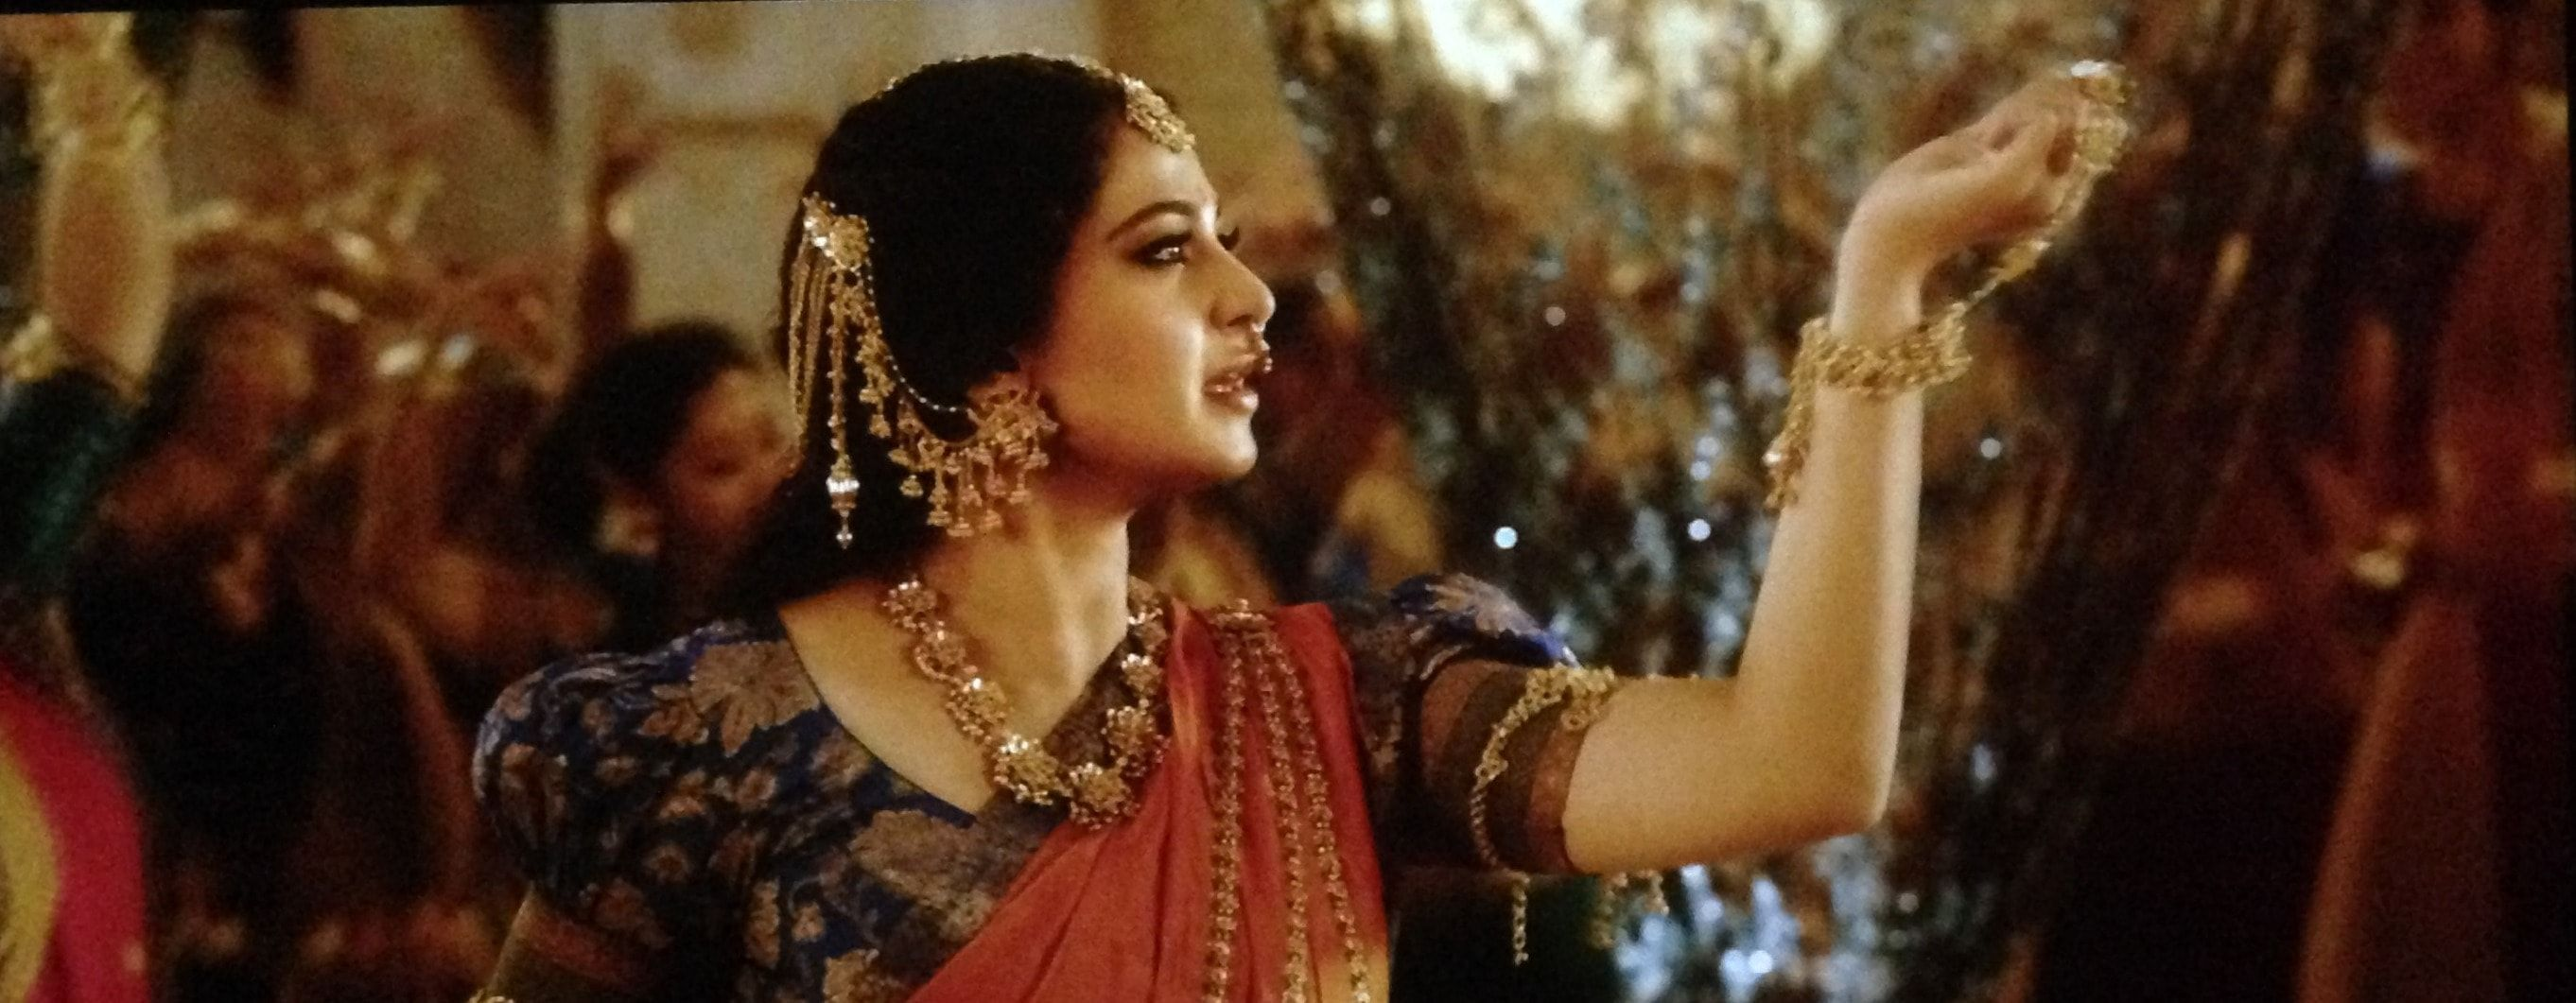 Ba bahubali 2 hd wallpapers - Anushka Shetty In Bahubali 2 The Conclusion